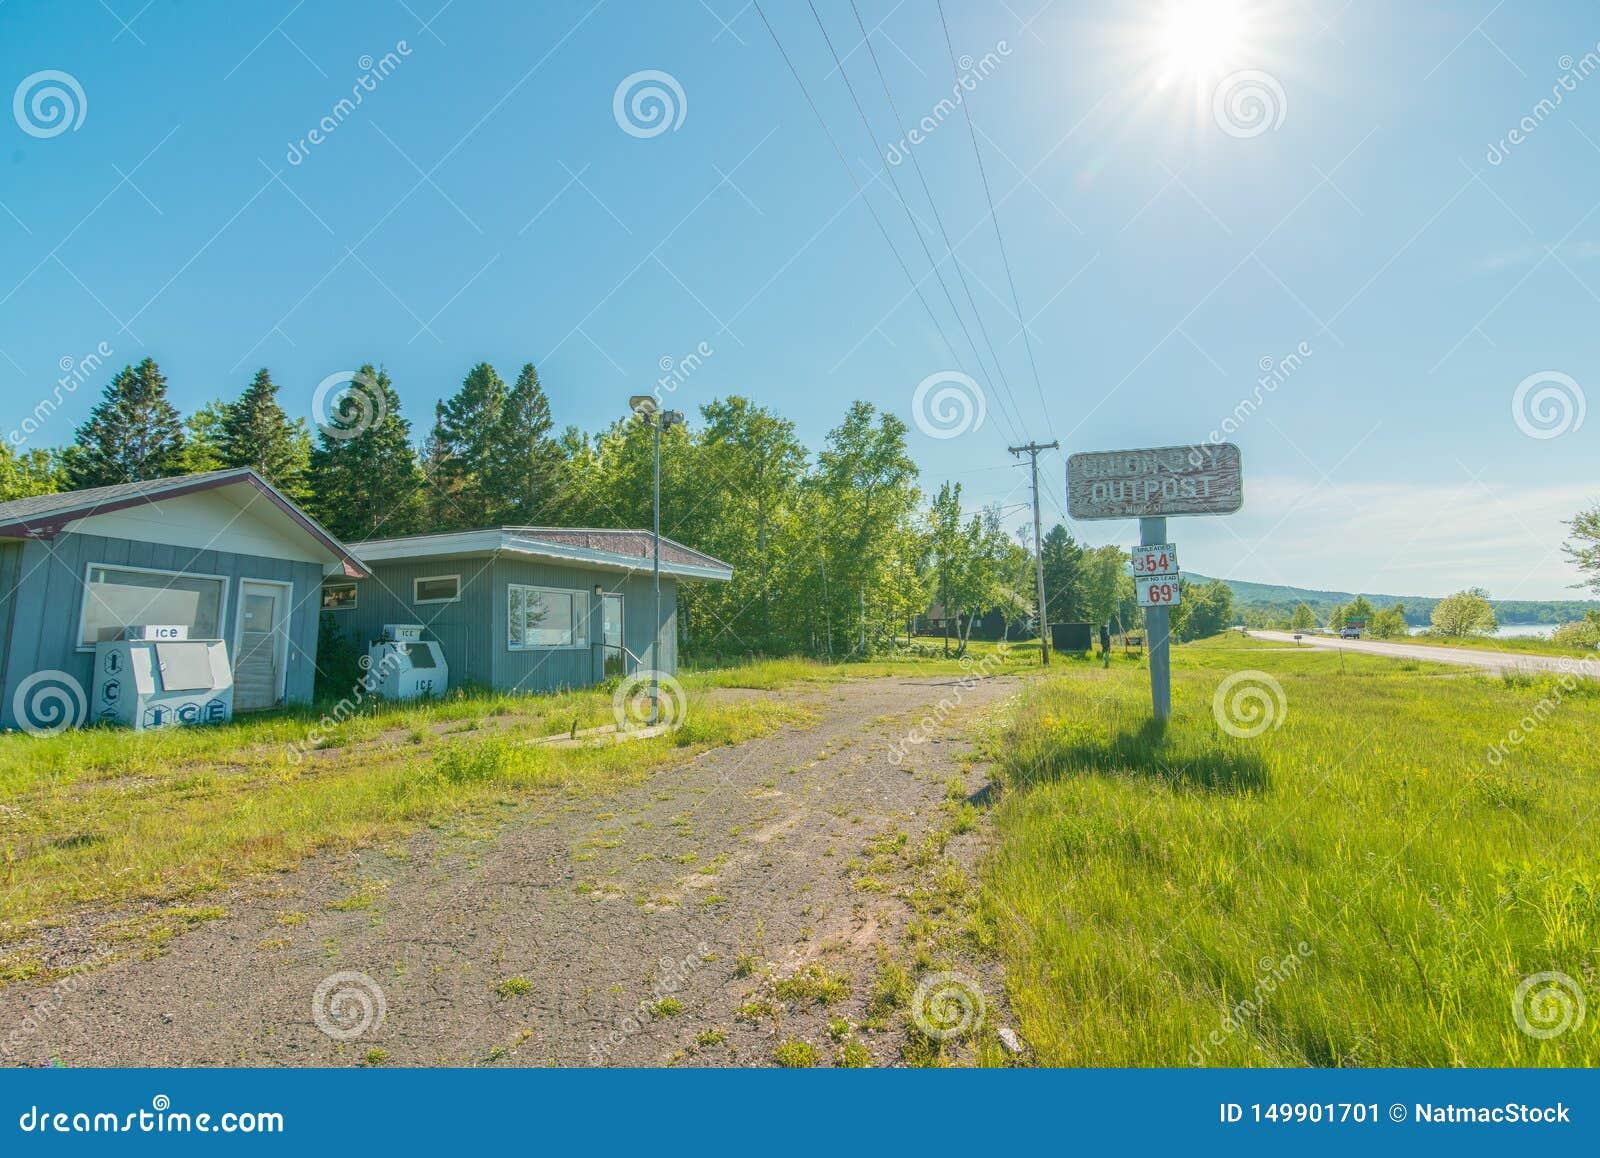 CARP LAKE TOWNSHIP, MICHIGAN / USA - JUNE 16, 2016: Abandoned shut down gas station / convenience store - nature growing back - ru